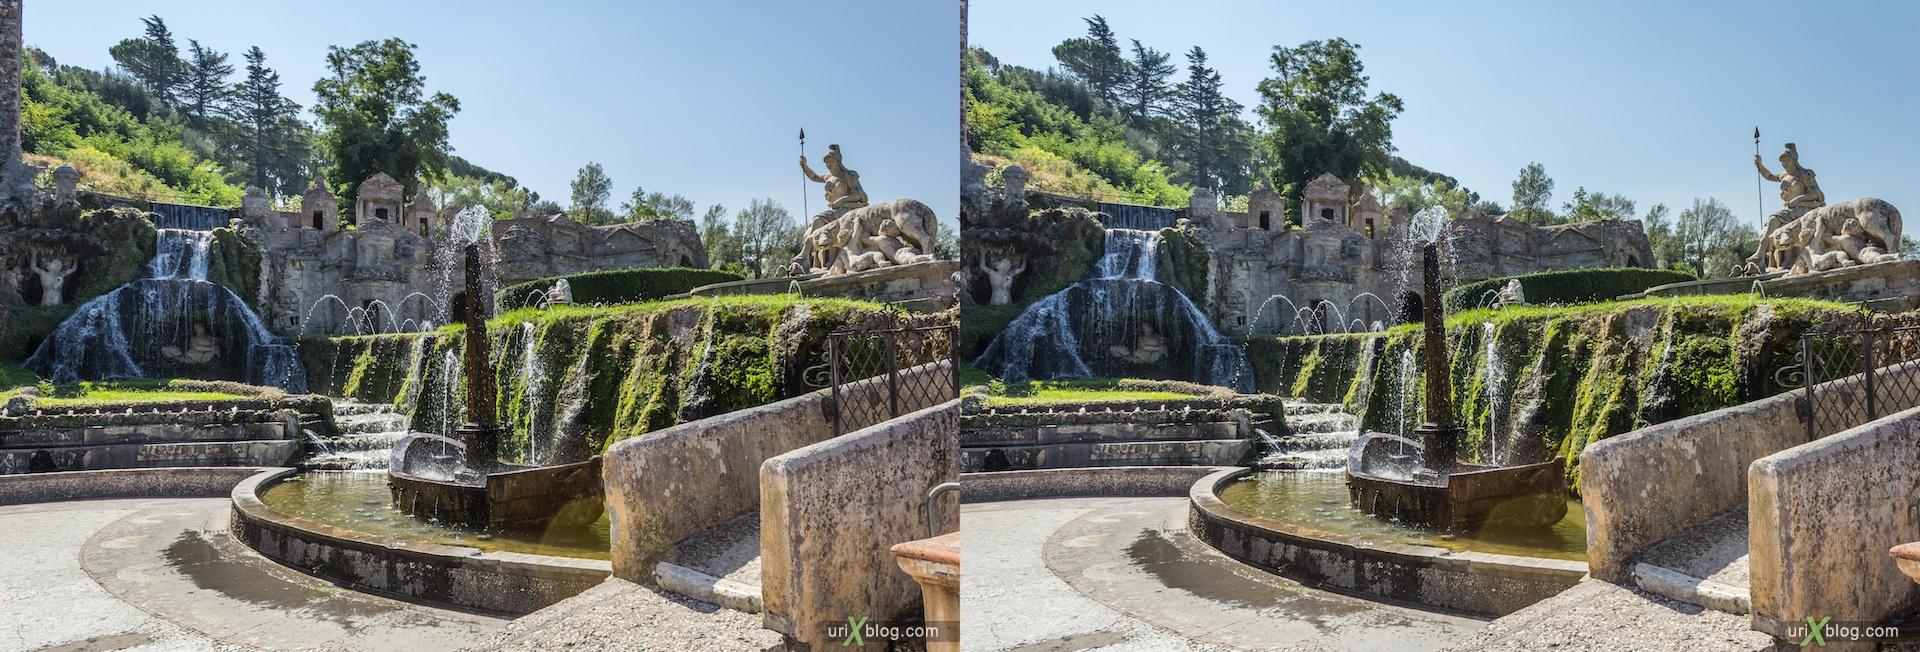 2012, Fountain of Rometta, Fontana della Rometta, villa D'Este, Italy, Tivoli, Rome, 3D, stereo pair, cross-eyed, crossview, cross view stereo pair